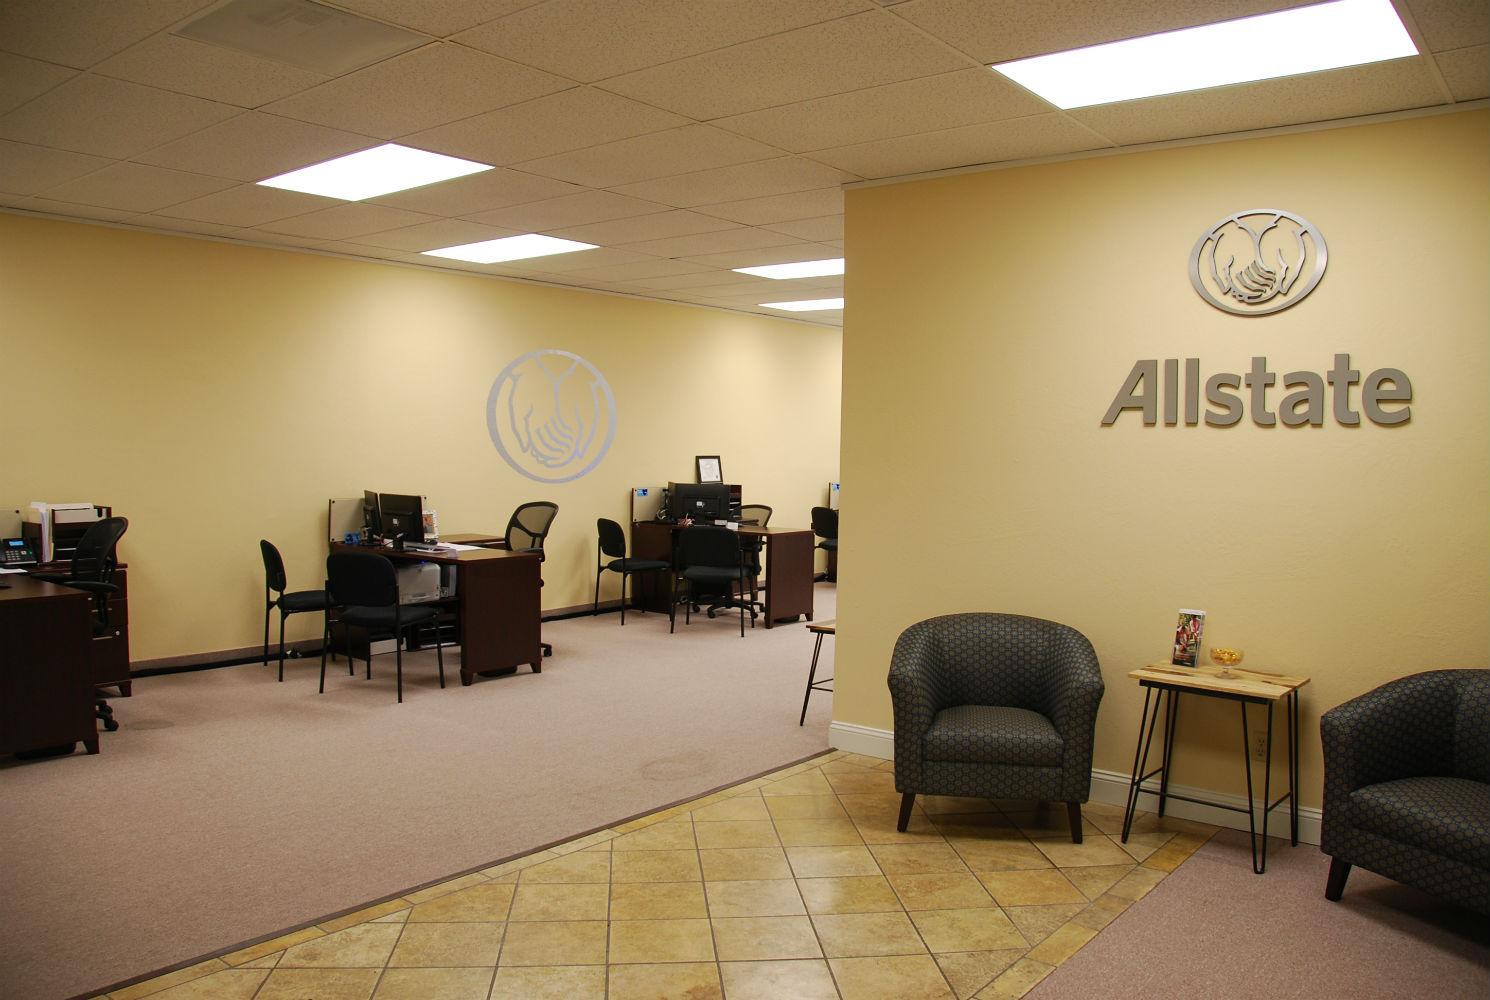 Rudy Ortiz: Allstate Insurance image 2